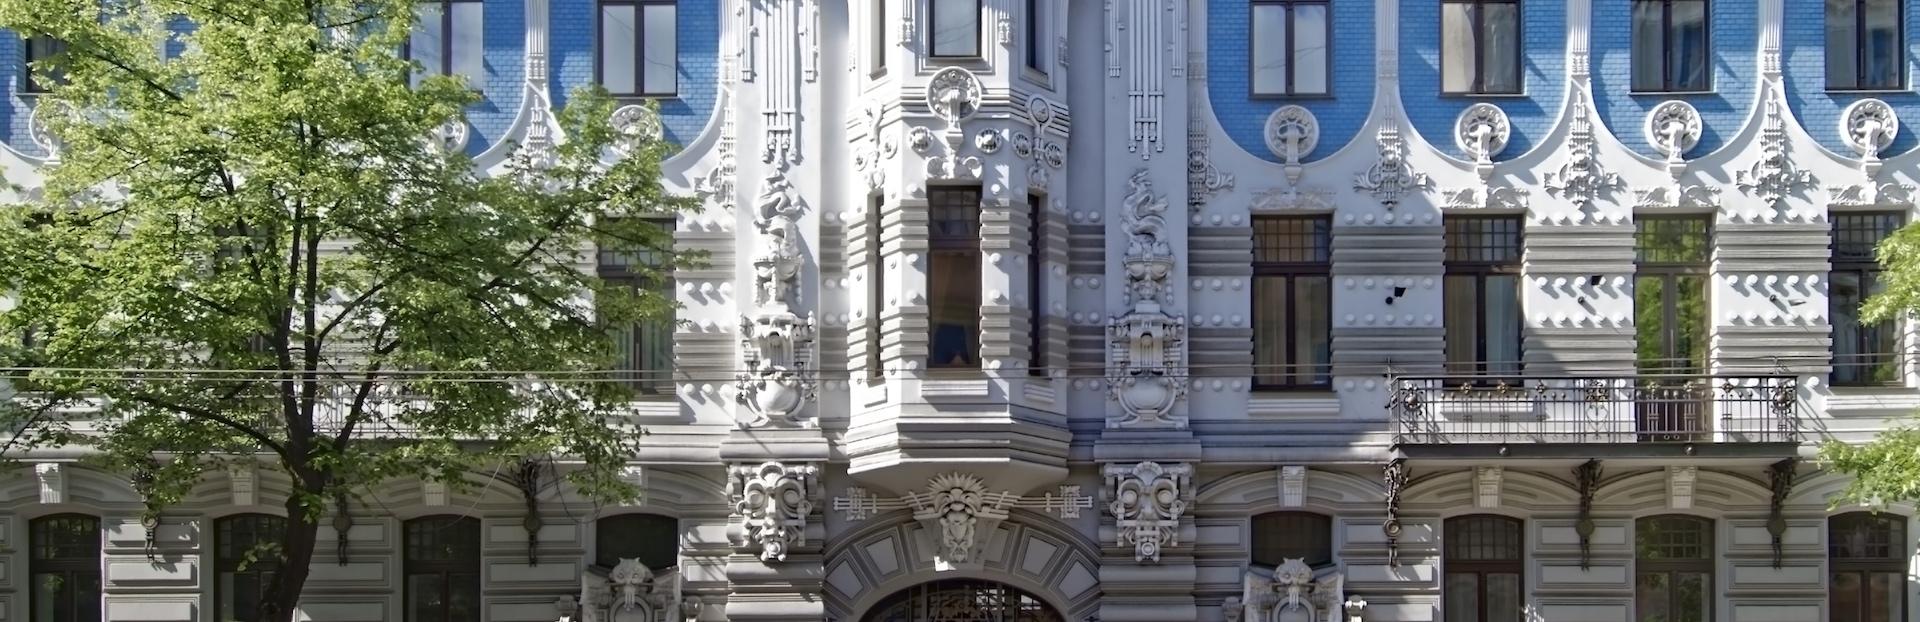 Riga audio tour: Riga's Architecture: The World's Art Nouveau Capital